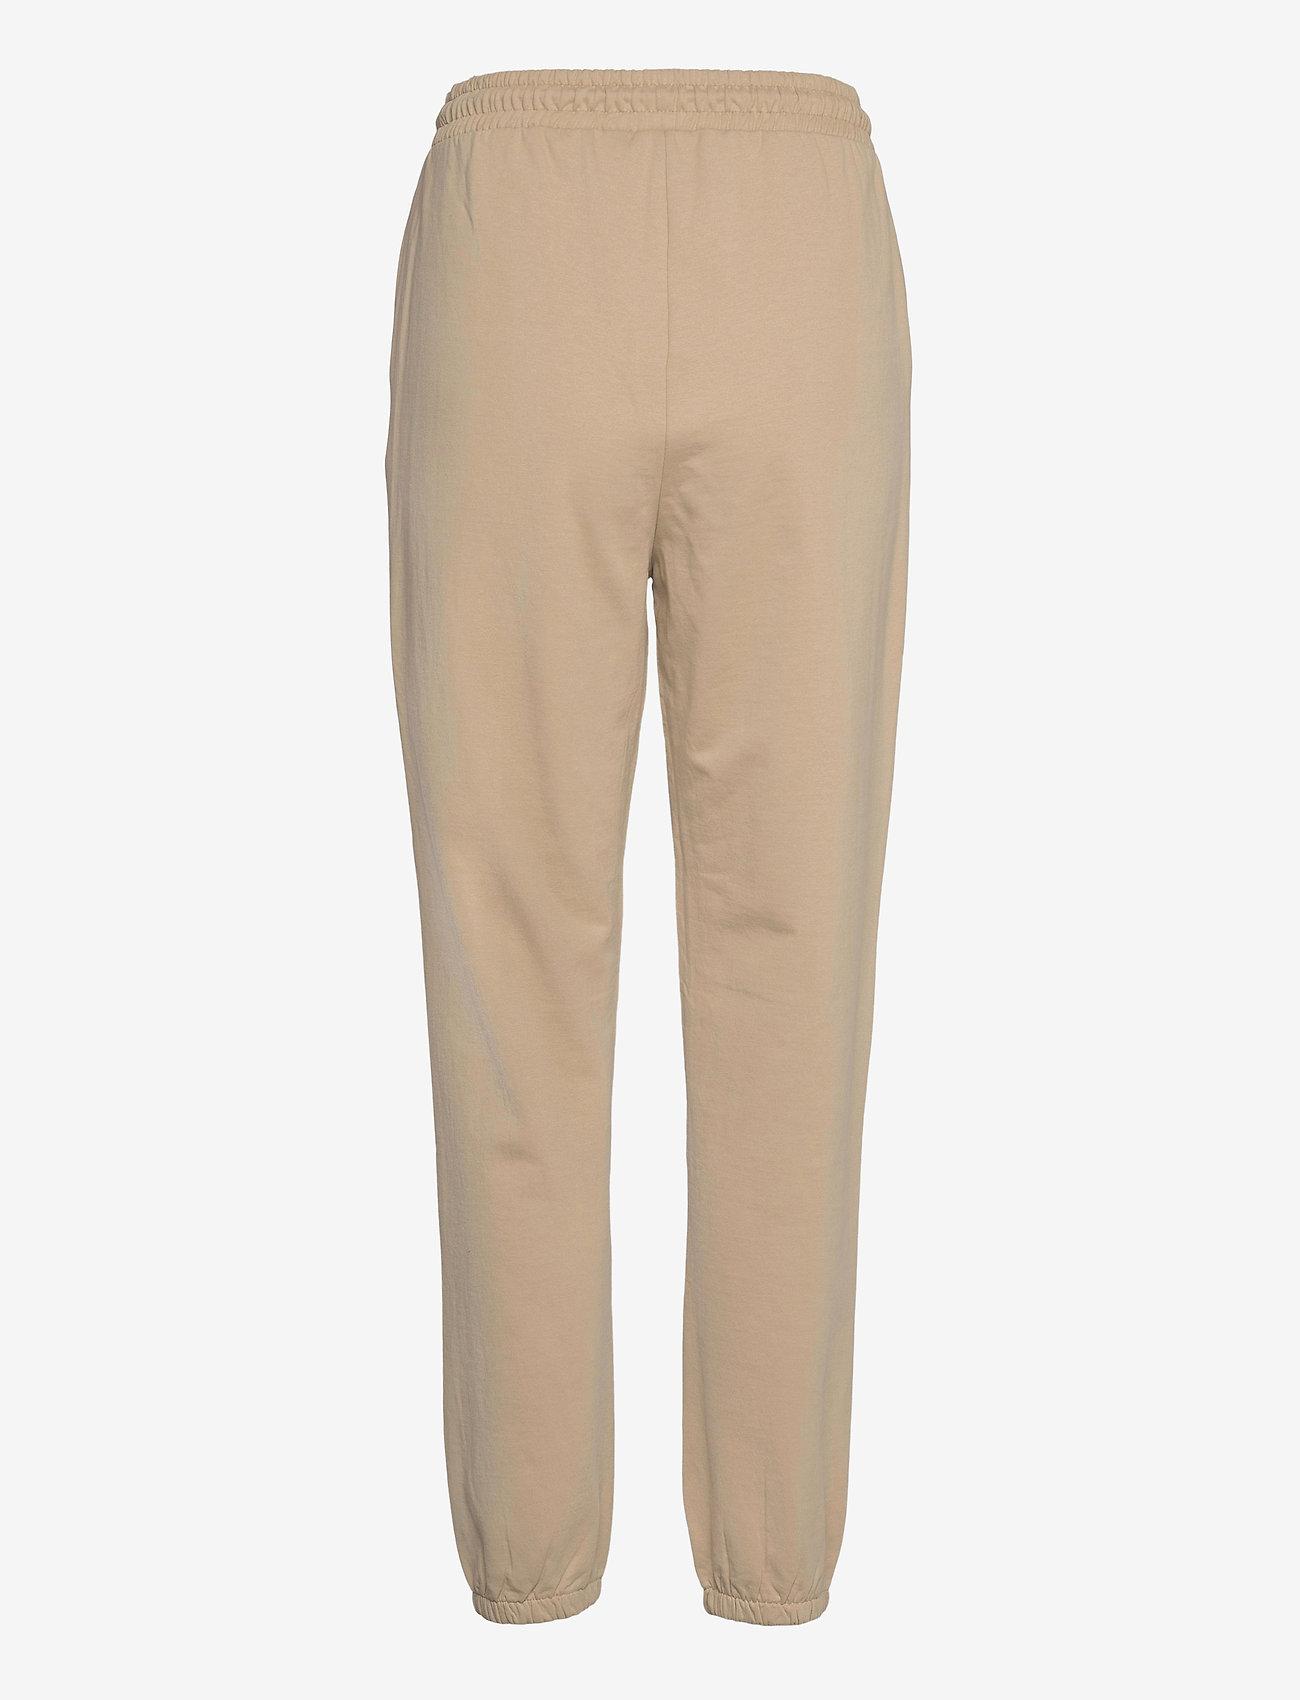 Vero Moda - VMOCTAVIA HW SWEAT PANT GA - kläder - white pepper - 1